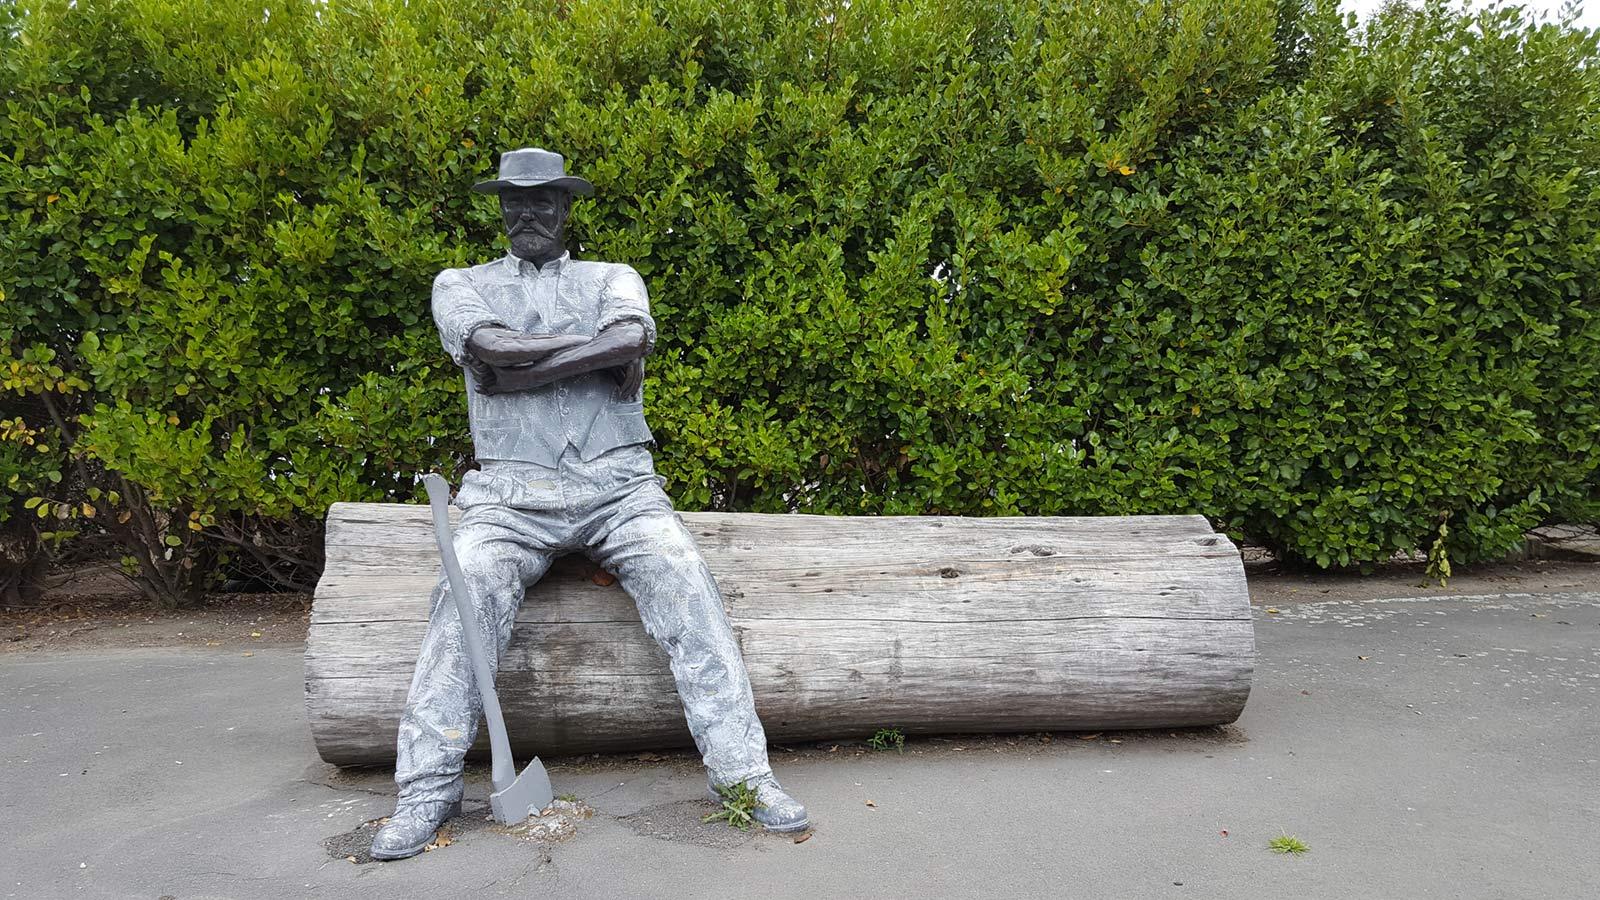 The Bushman Sculpture